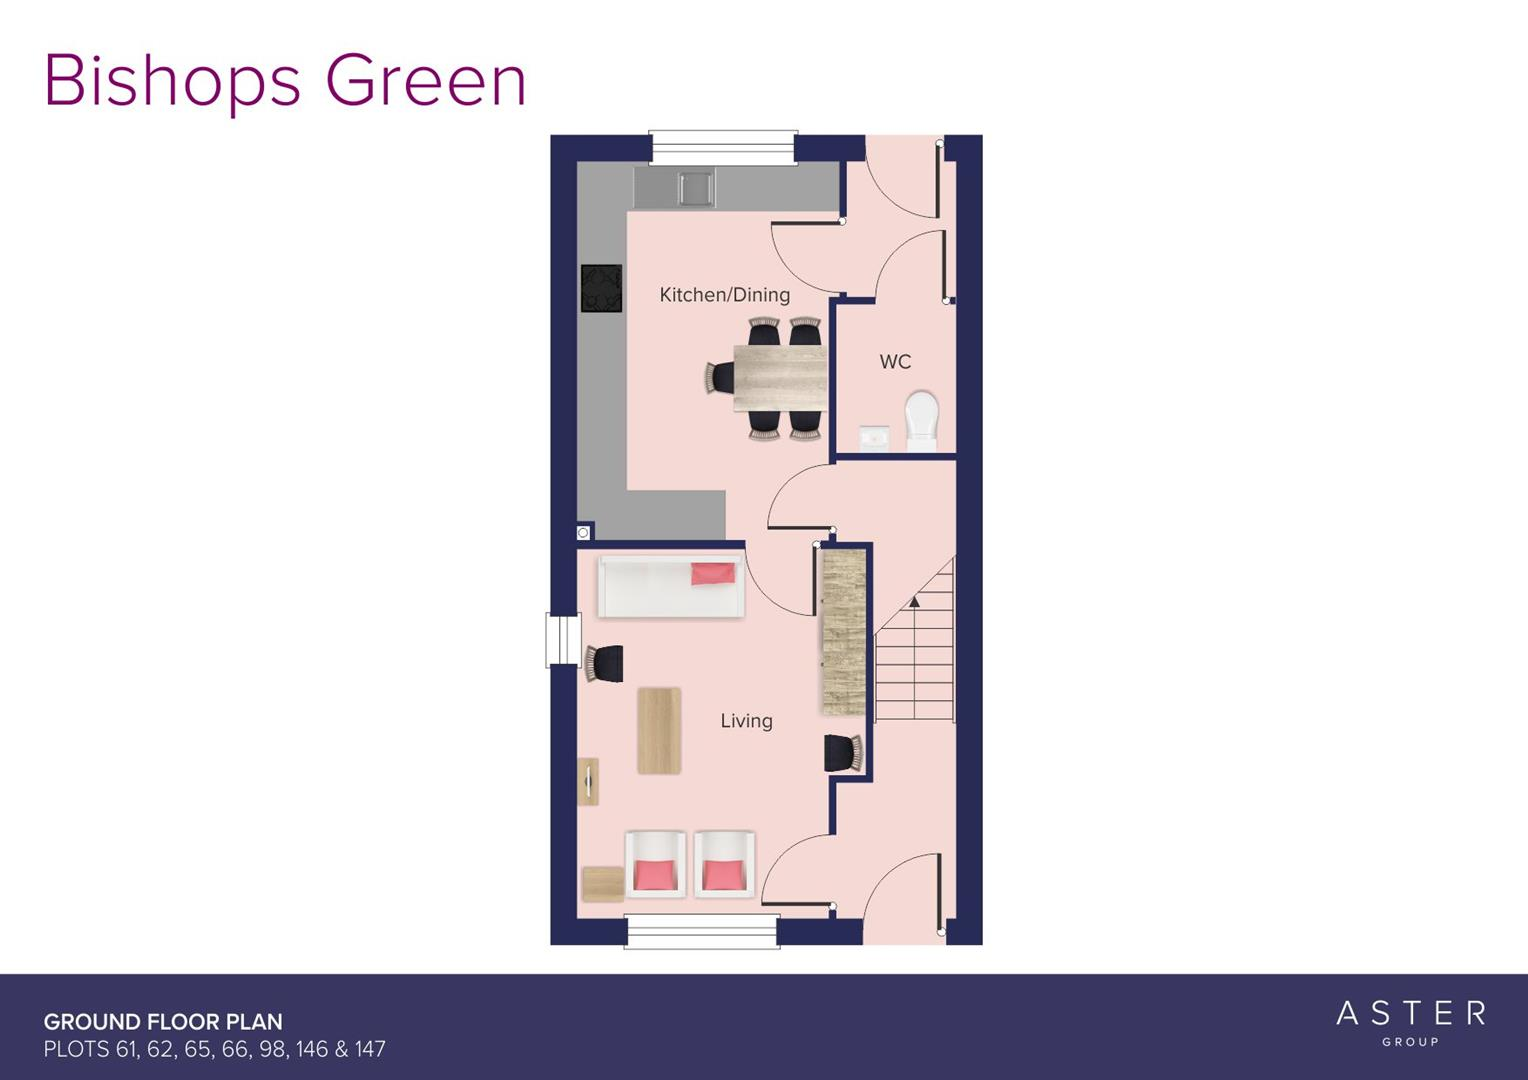 Bishops Green_2D_61_62_65_66_98_146_147_GF_F.jpg